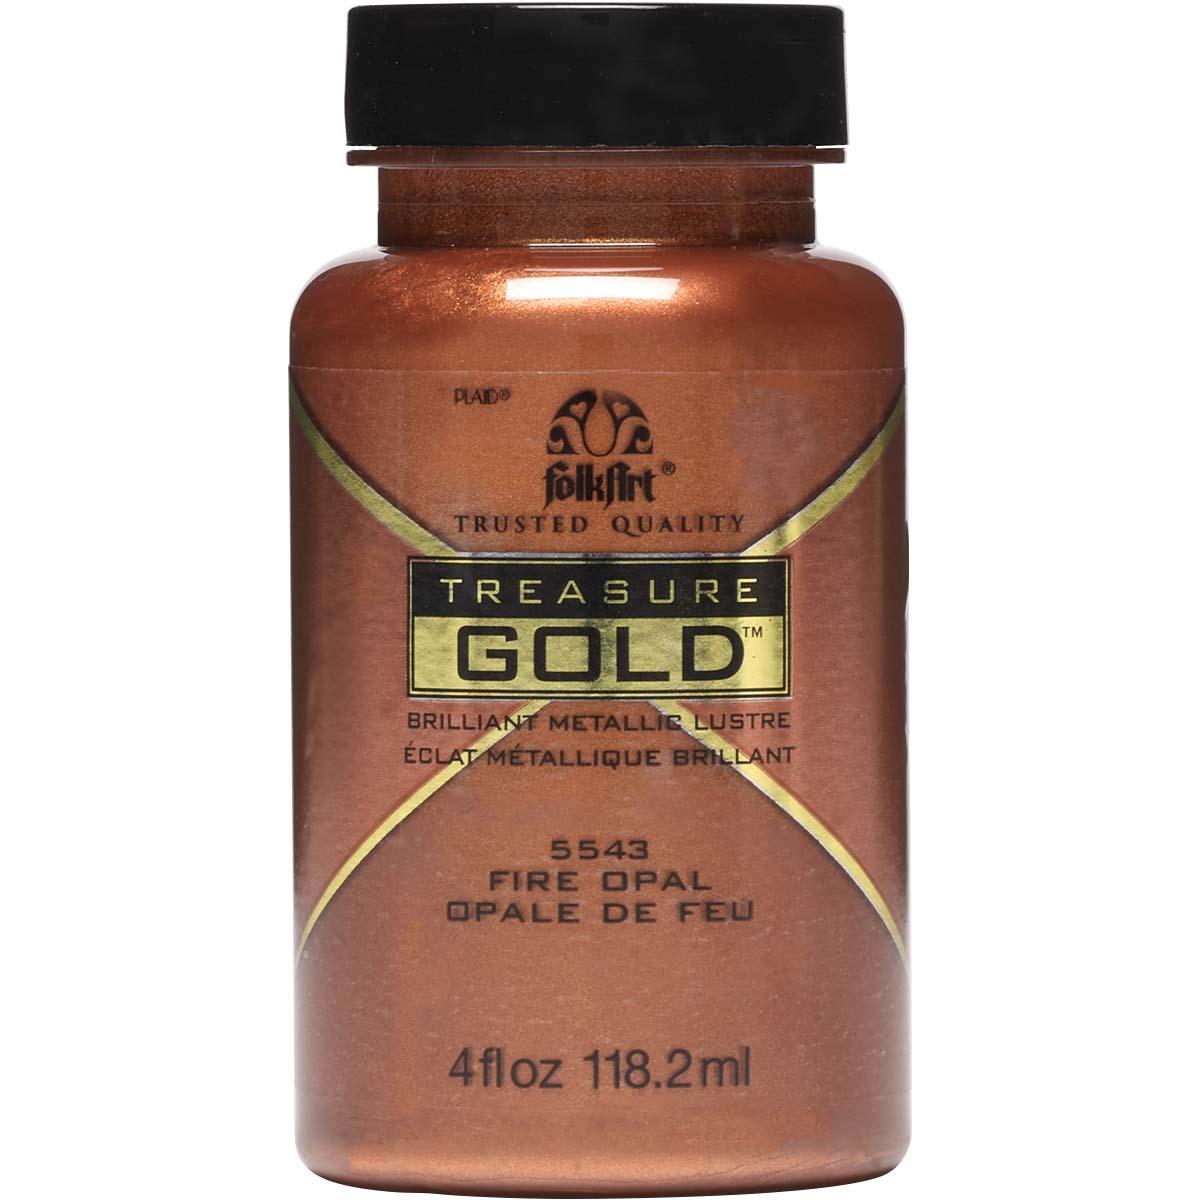 FolkArt ® Treasure Gold™ - Fire Opal, 4 oz. - 5543